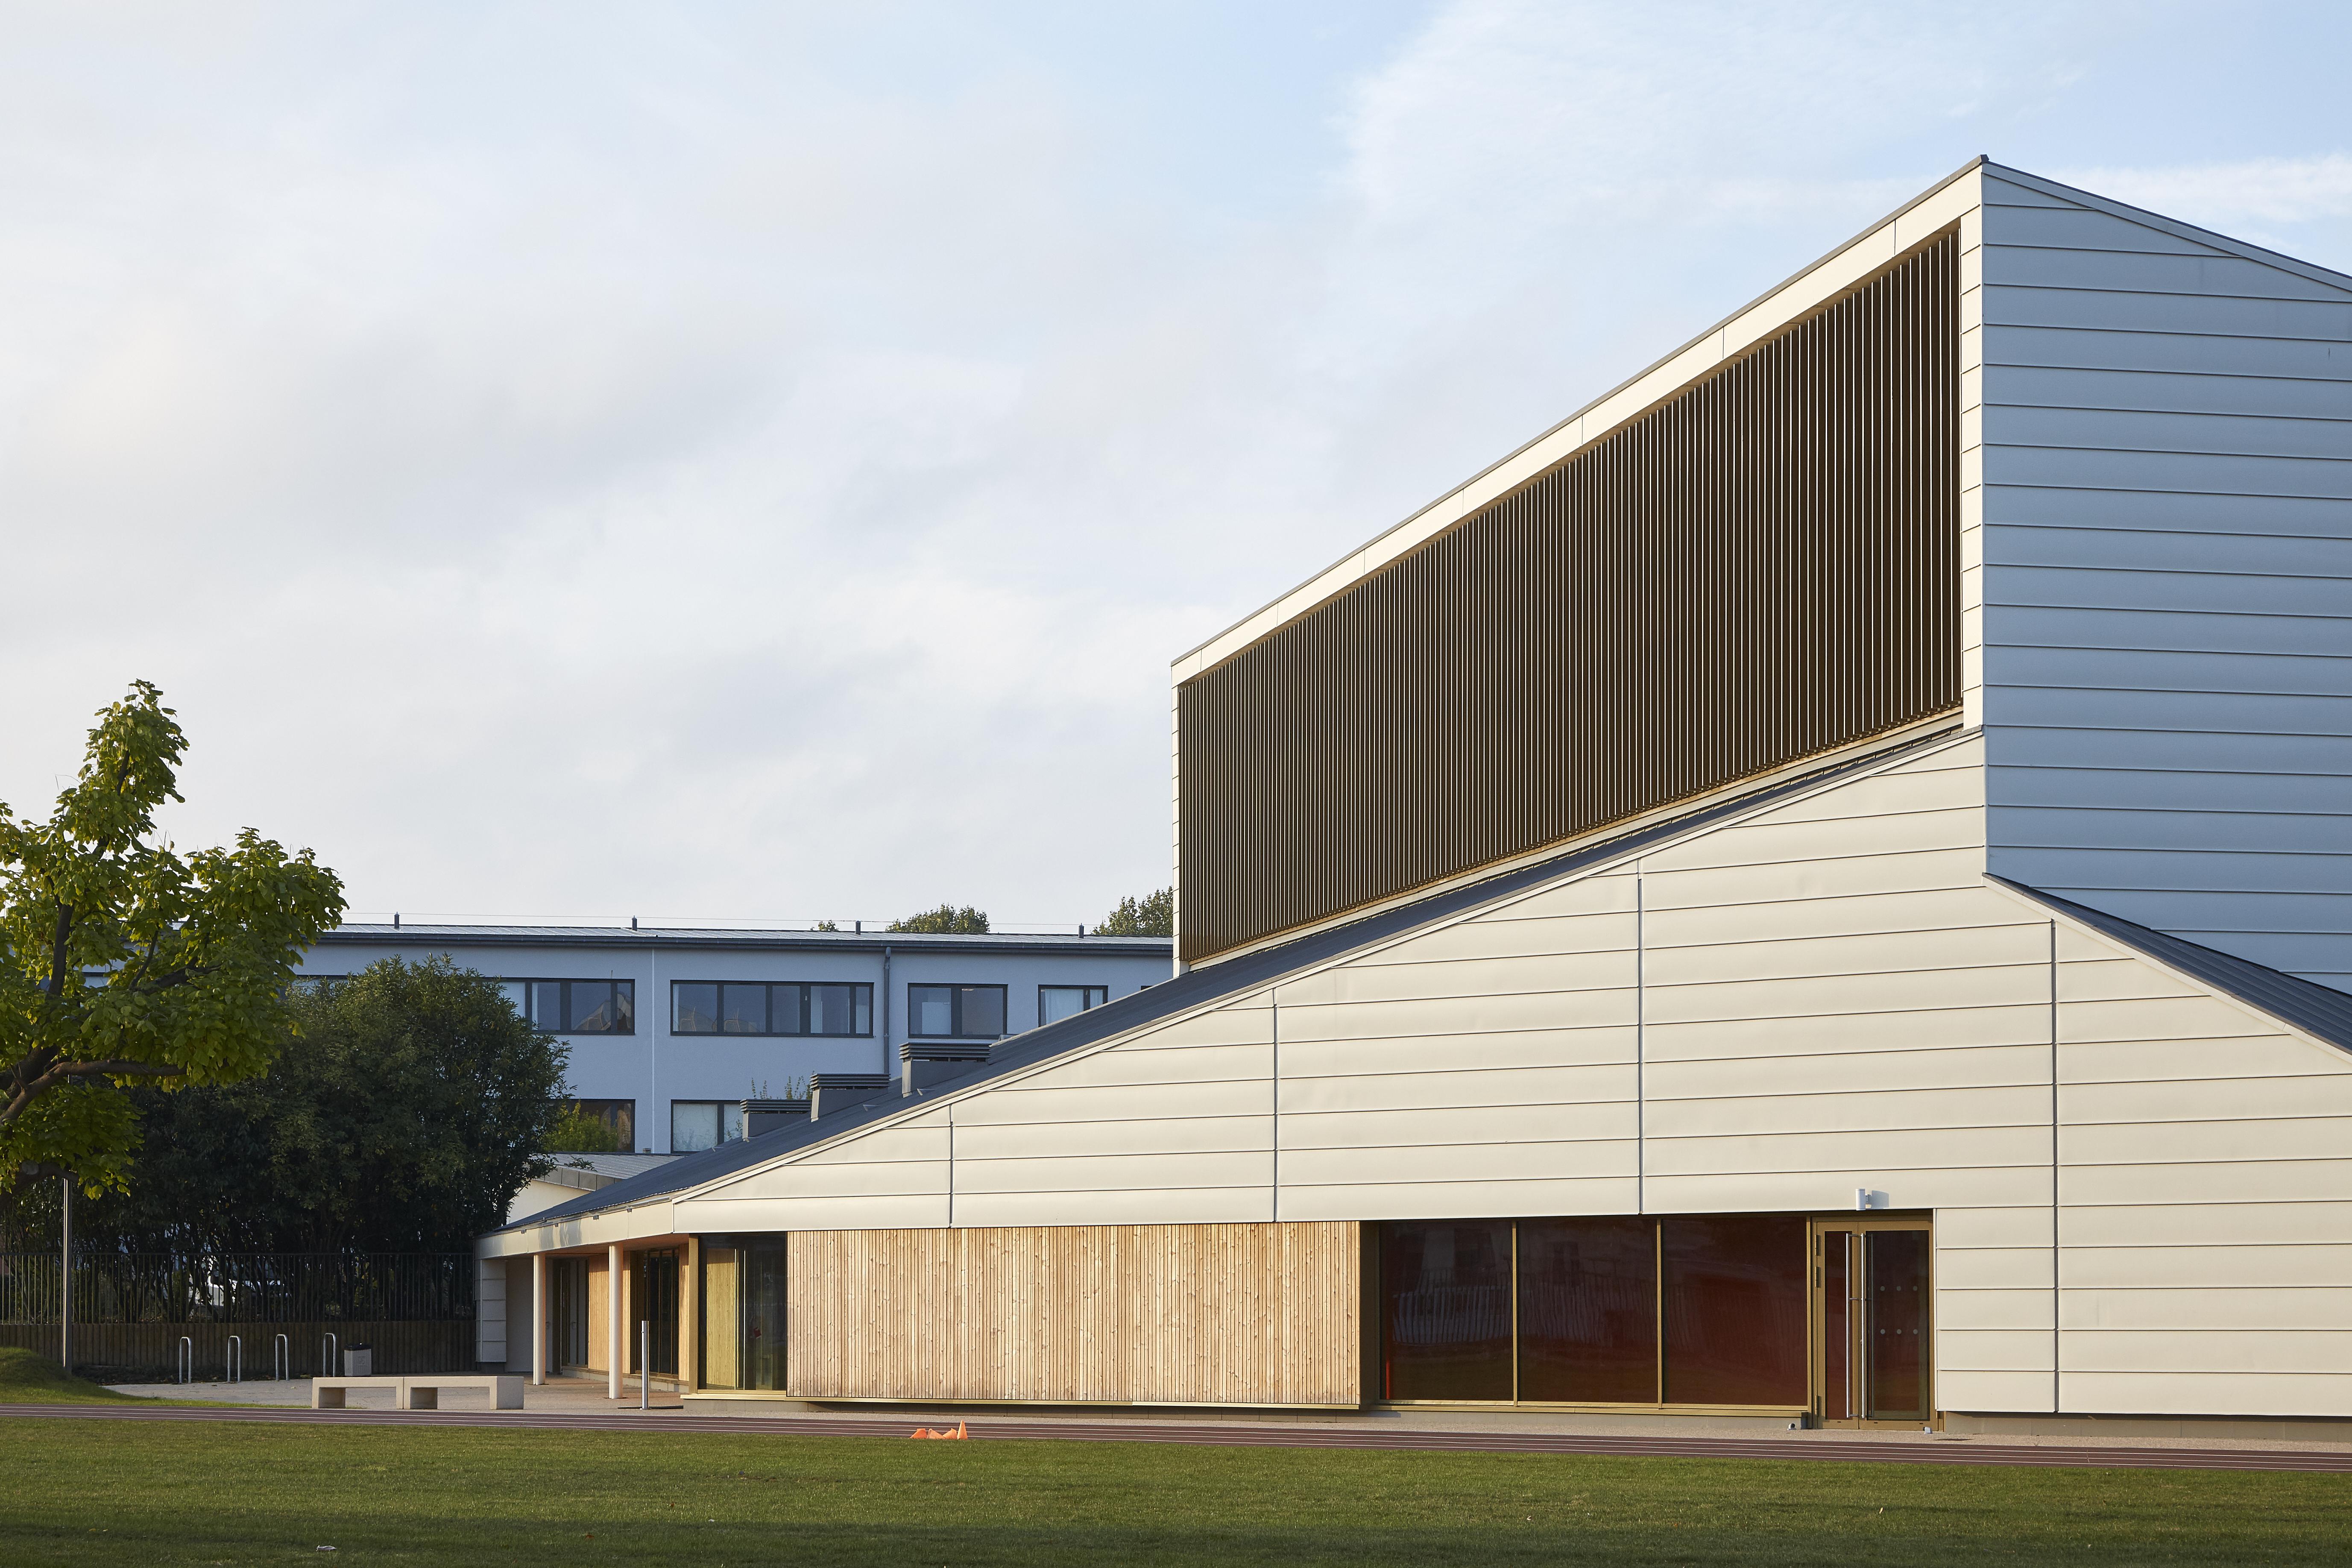 Gymnase Edouard branly Grand Quevilly zinc